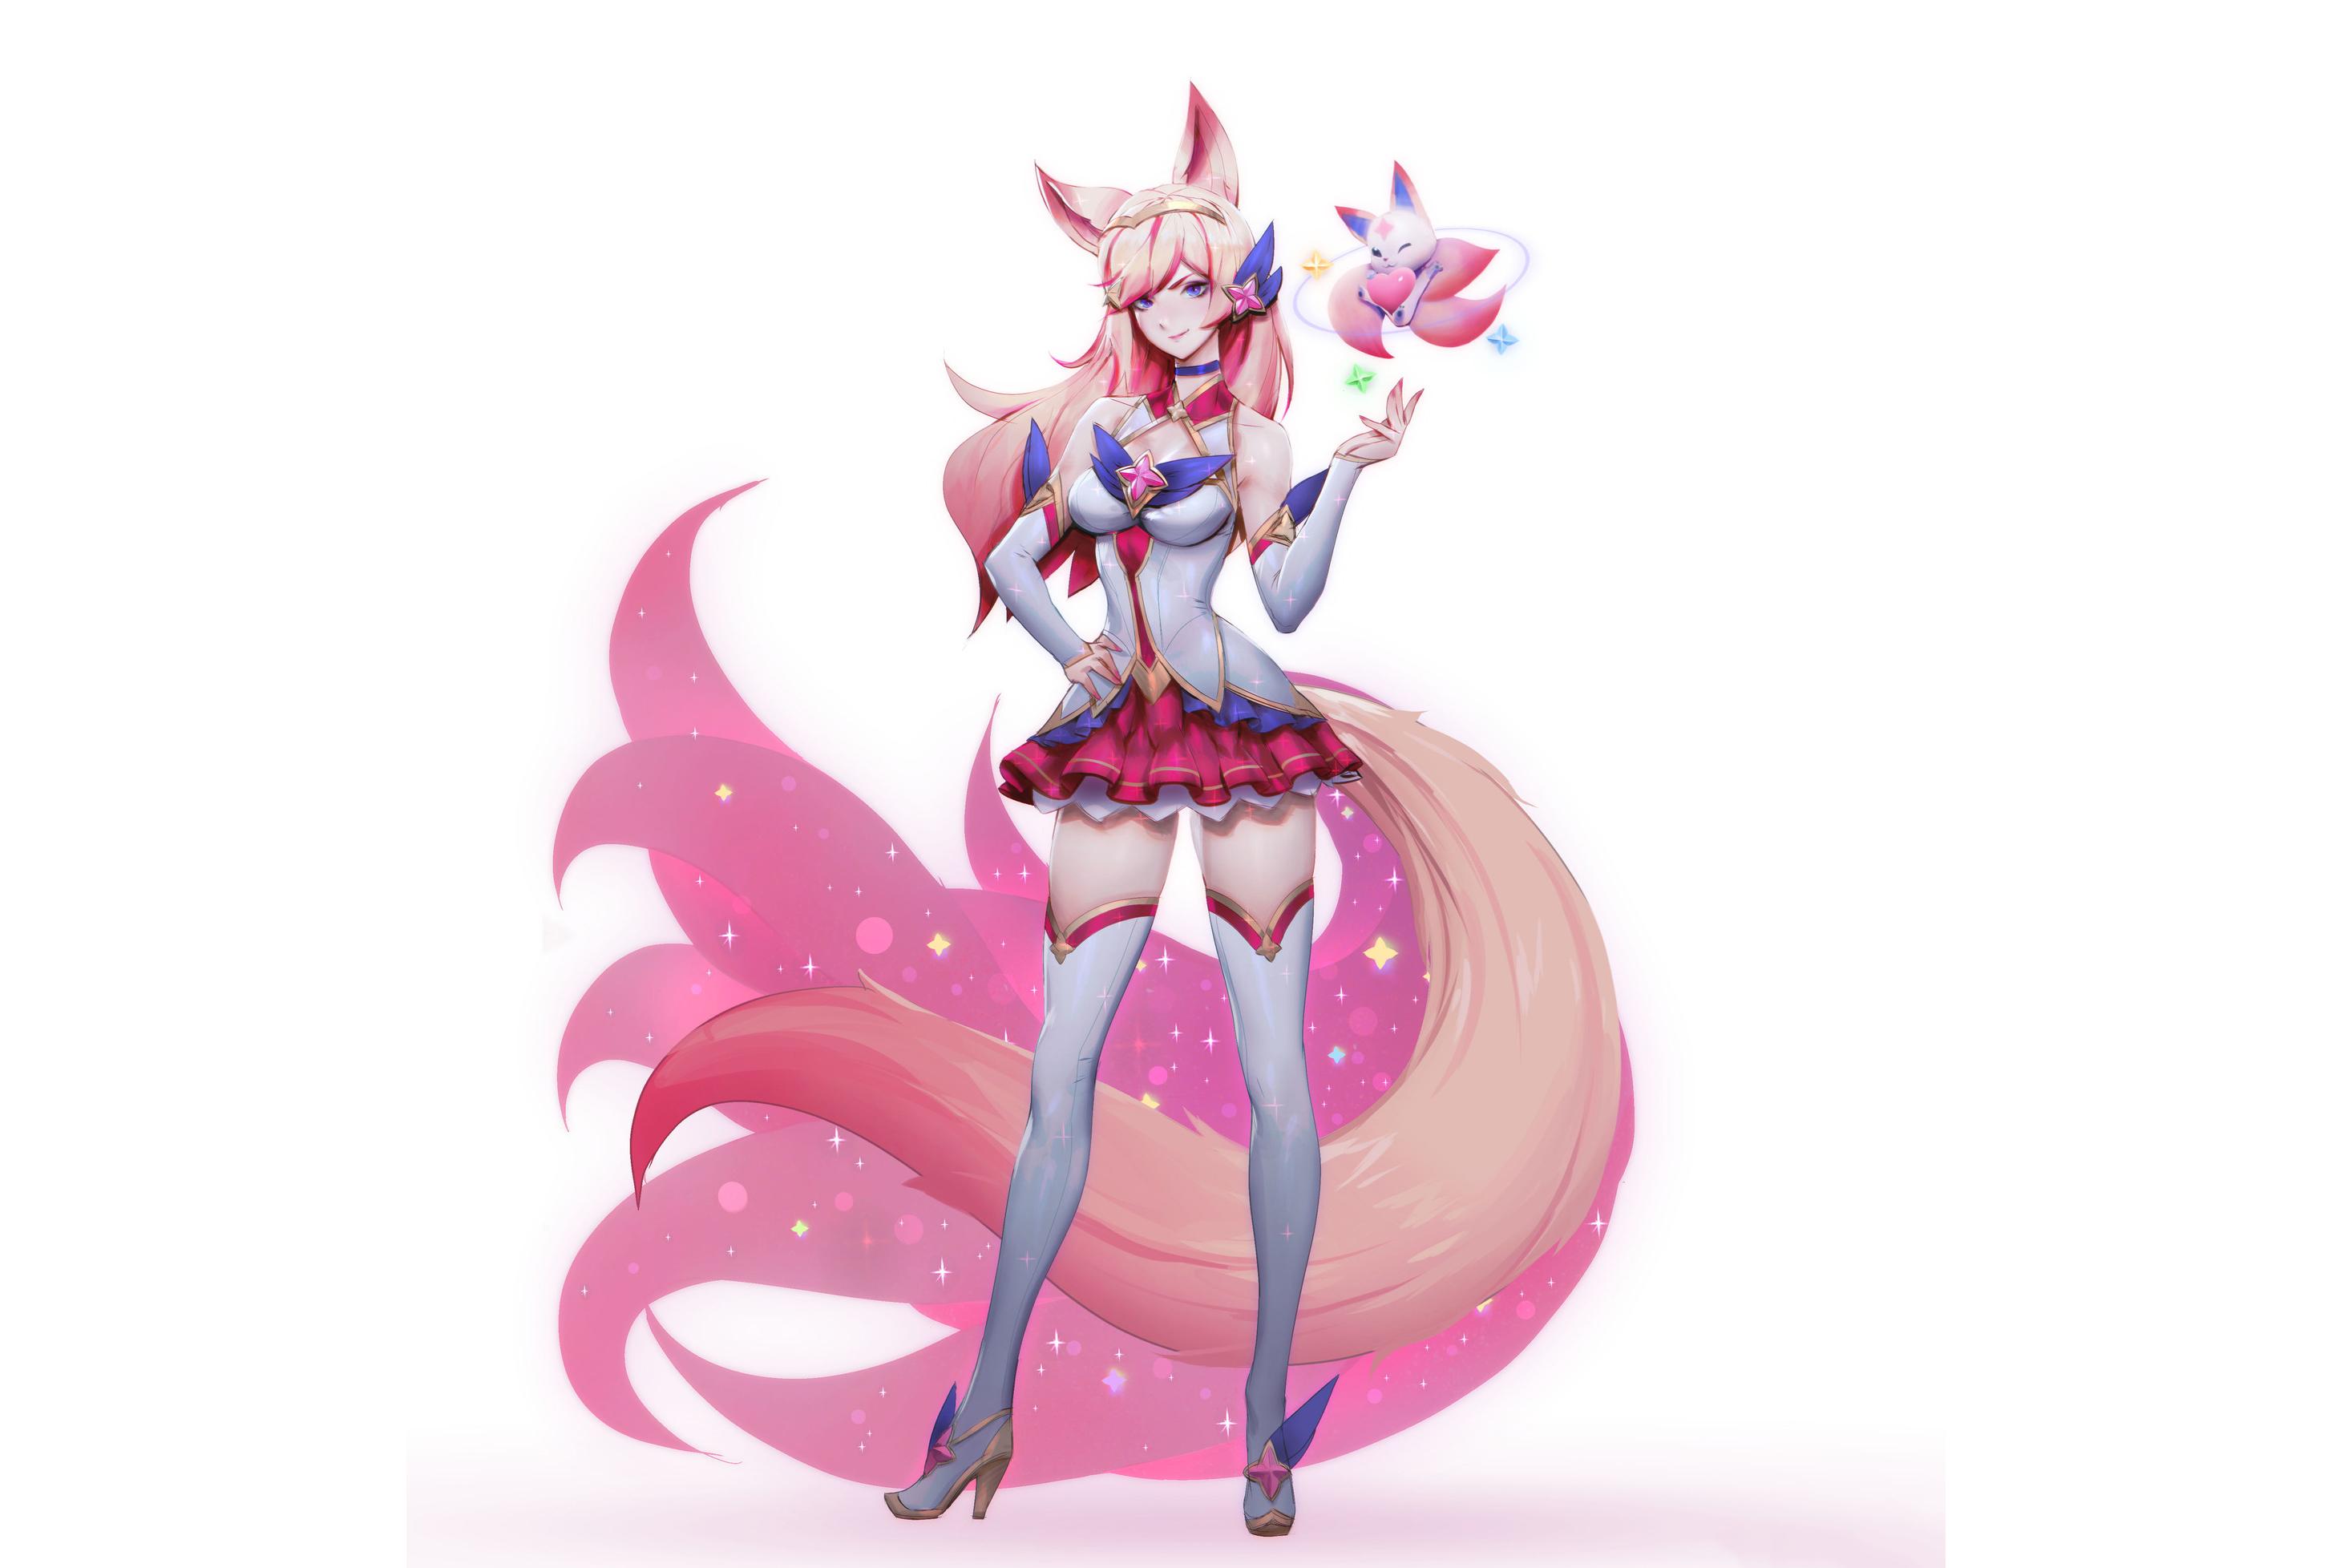 Anime 2934x1956 Ahri (League of Legends) Star Guardian Ahri League of Legends women